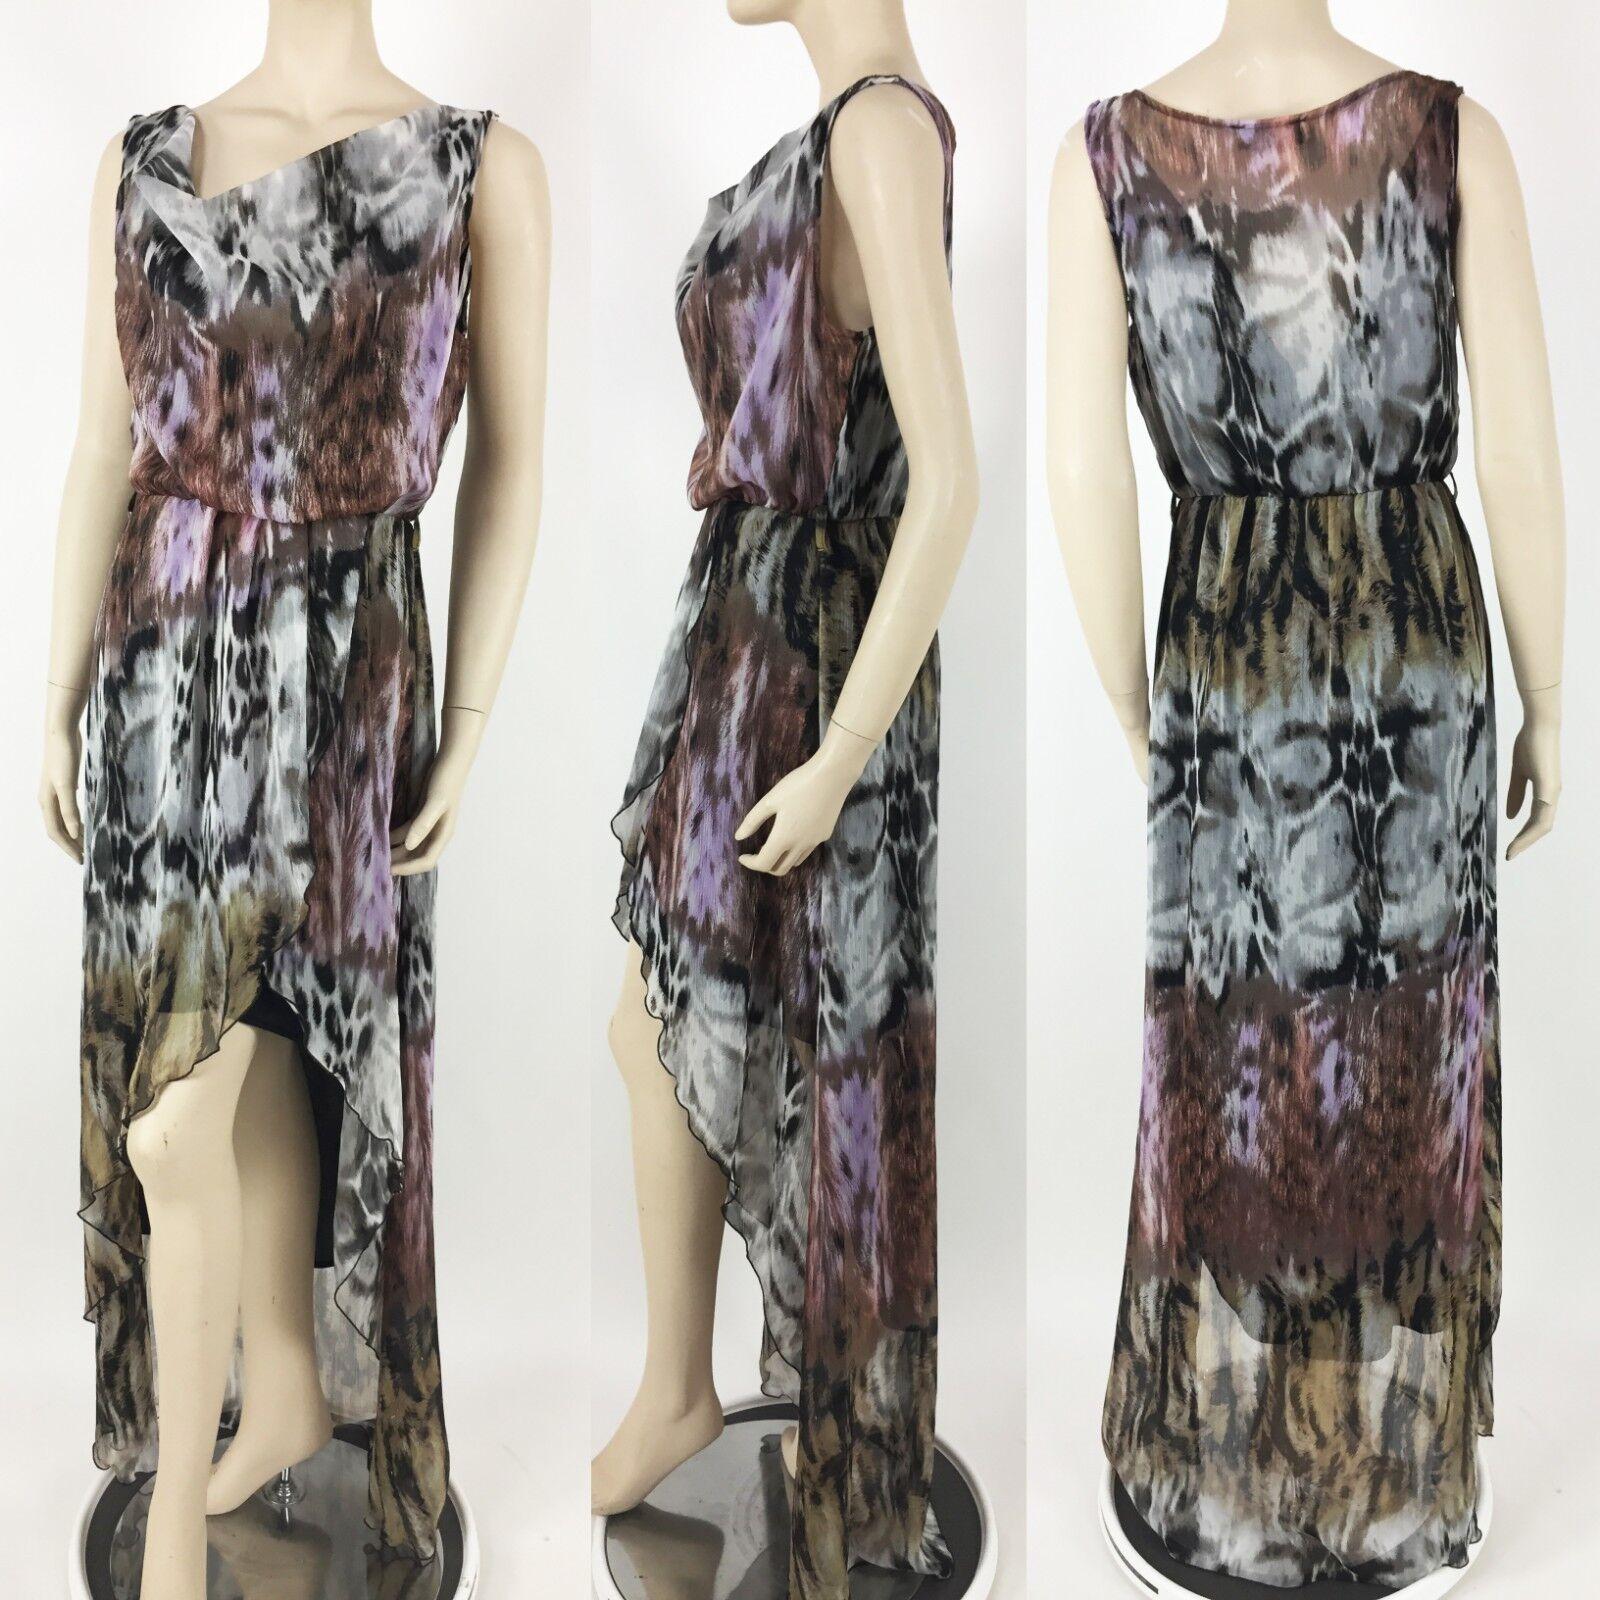 Casting Womens High Low Dress Size Small Boho Hi-Lo Hi-Lo Hi-Lo S Made in France  225 d70bdd